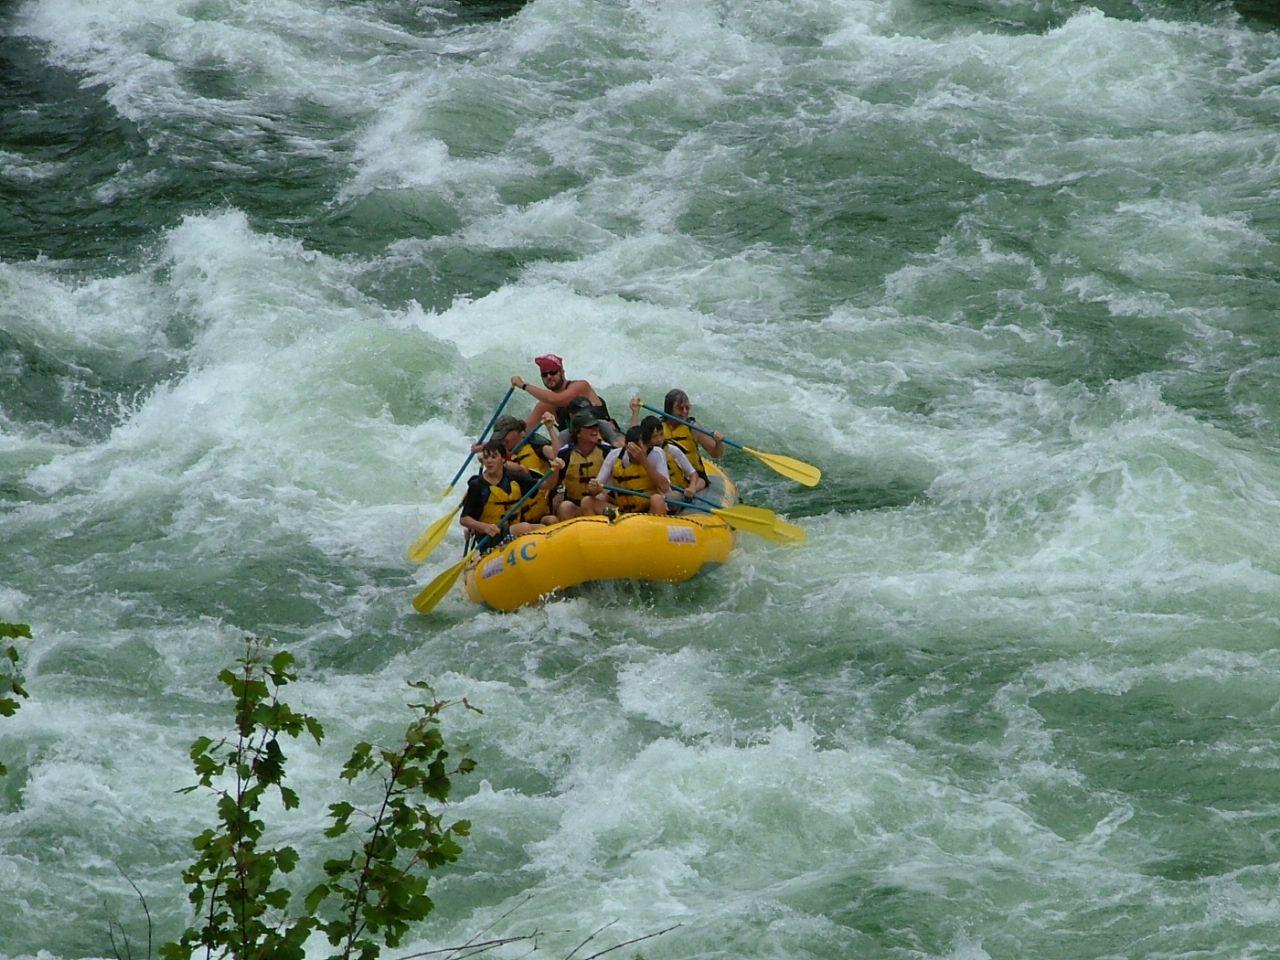 Go white water rafting White water rafting, Whitewater